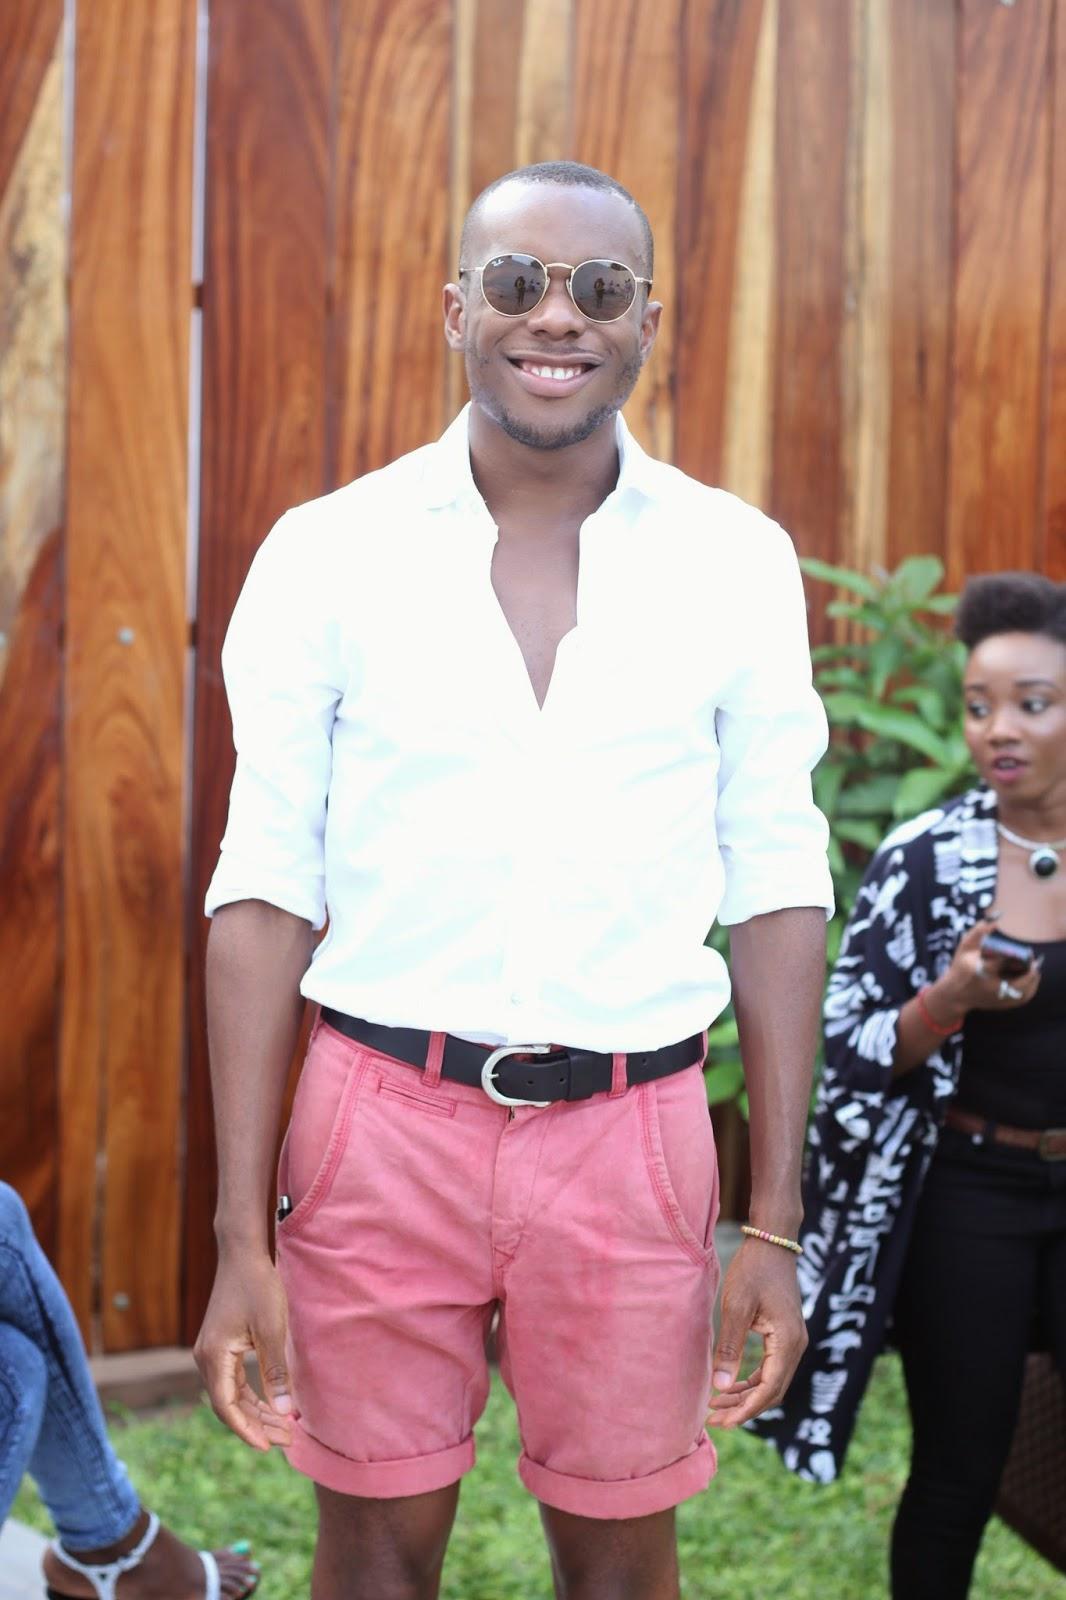 My Top 10 Nigerian Male Fashion Bloggers Based In Nigeria Mide Coker